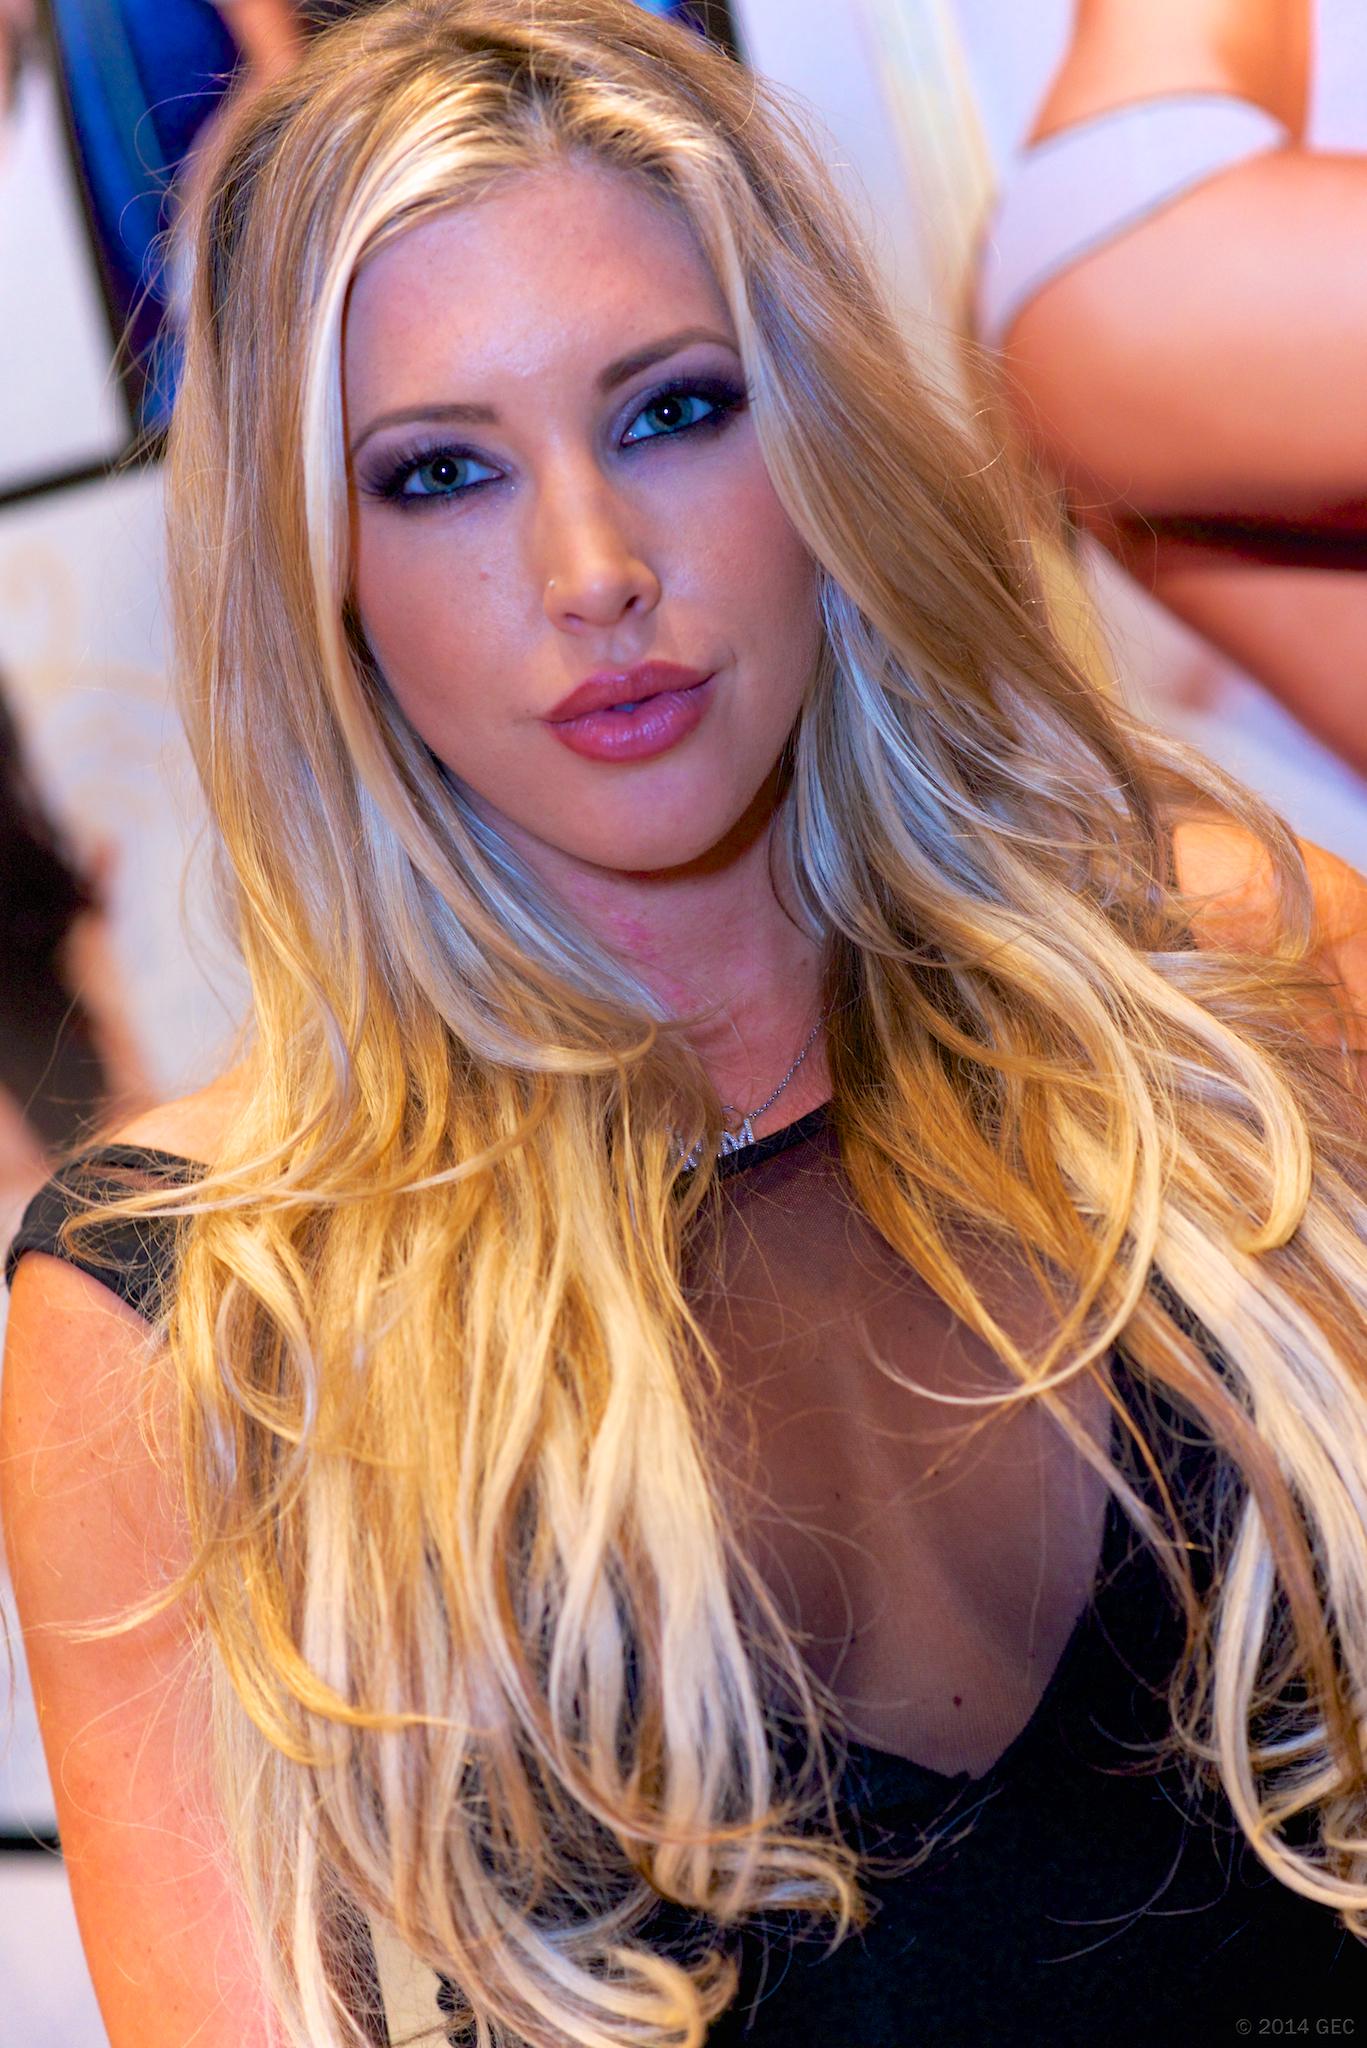 Sexy MILF Samantha Saint sucks on a huge cock as well as licking the ball sac № 1558696 бесплатно